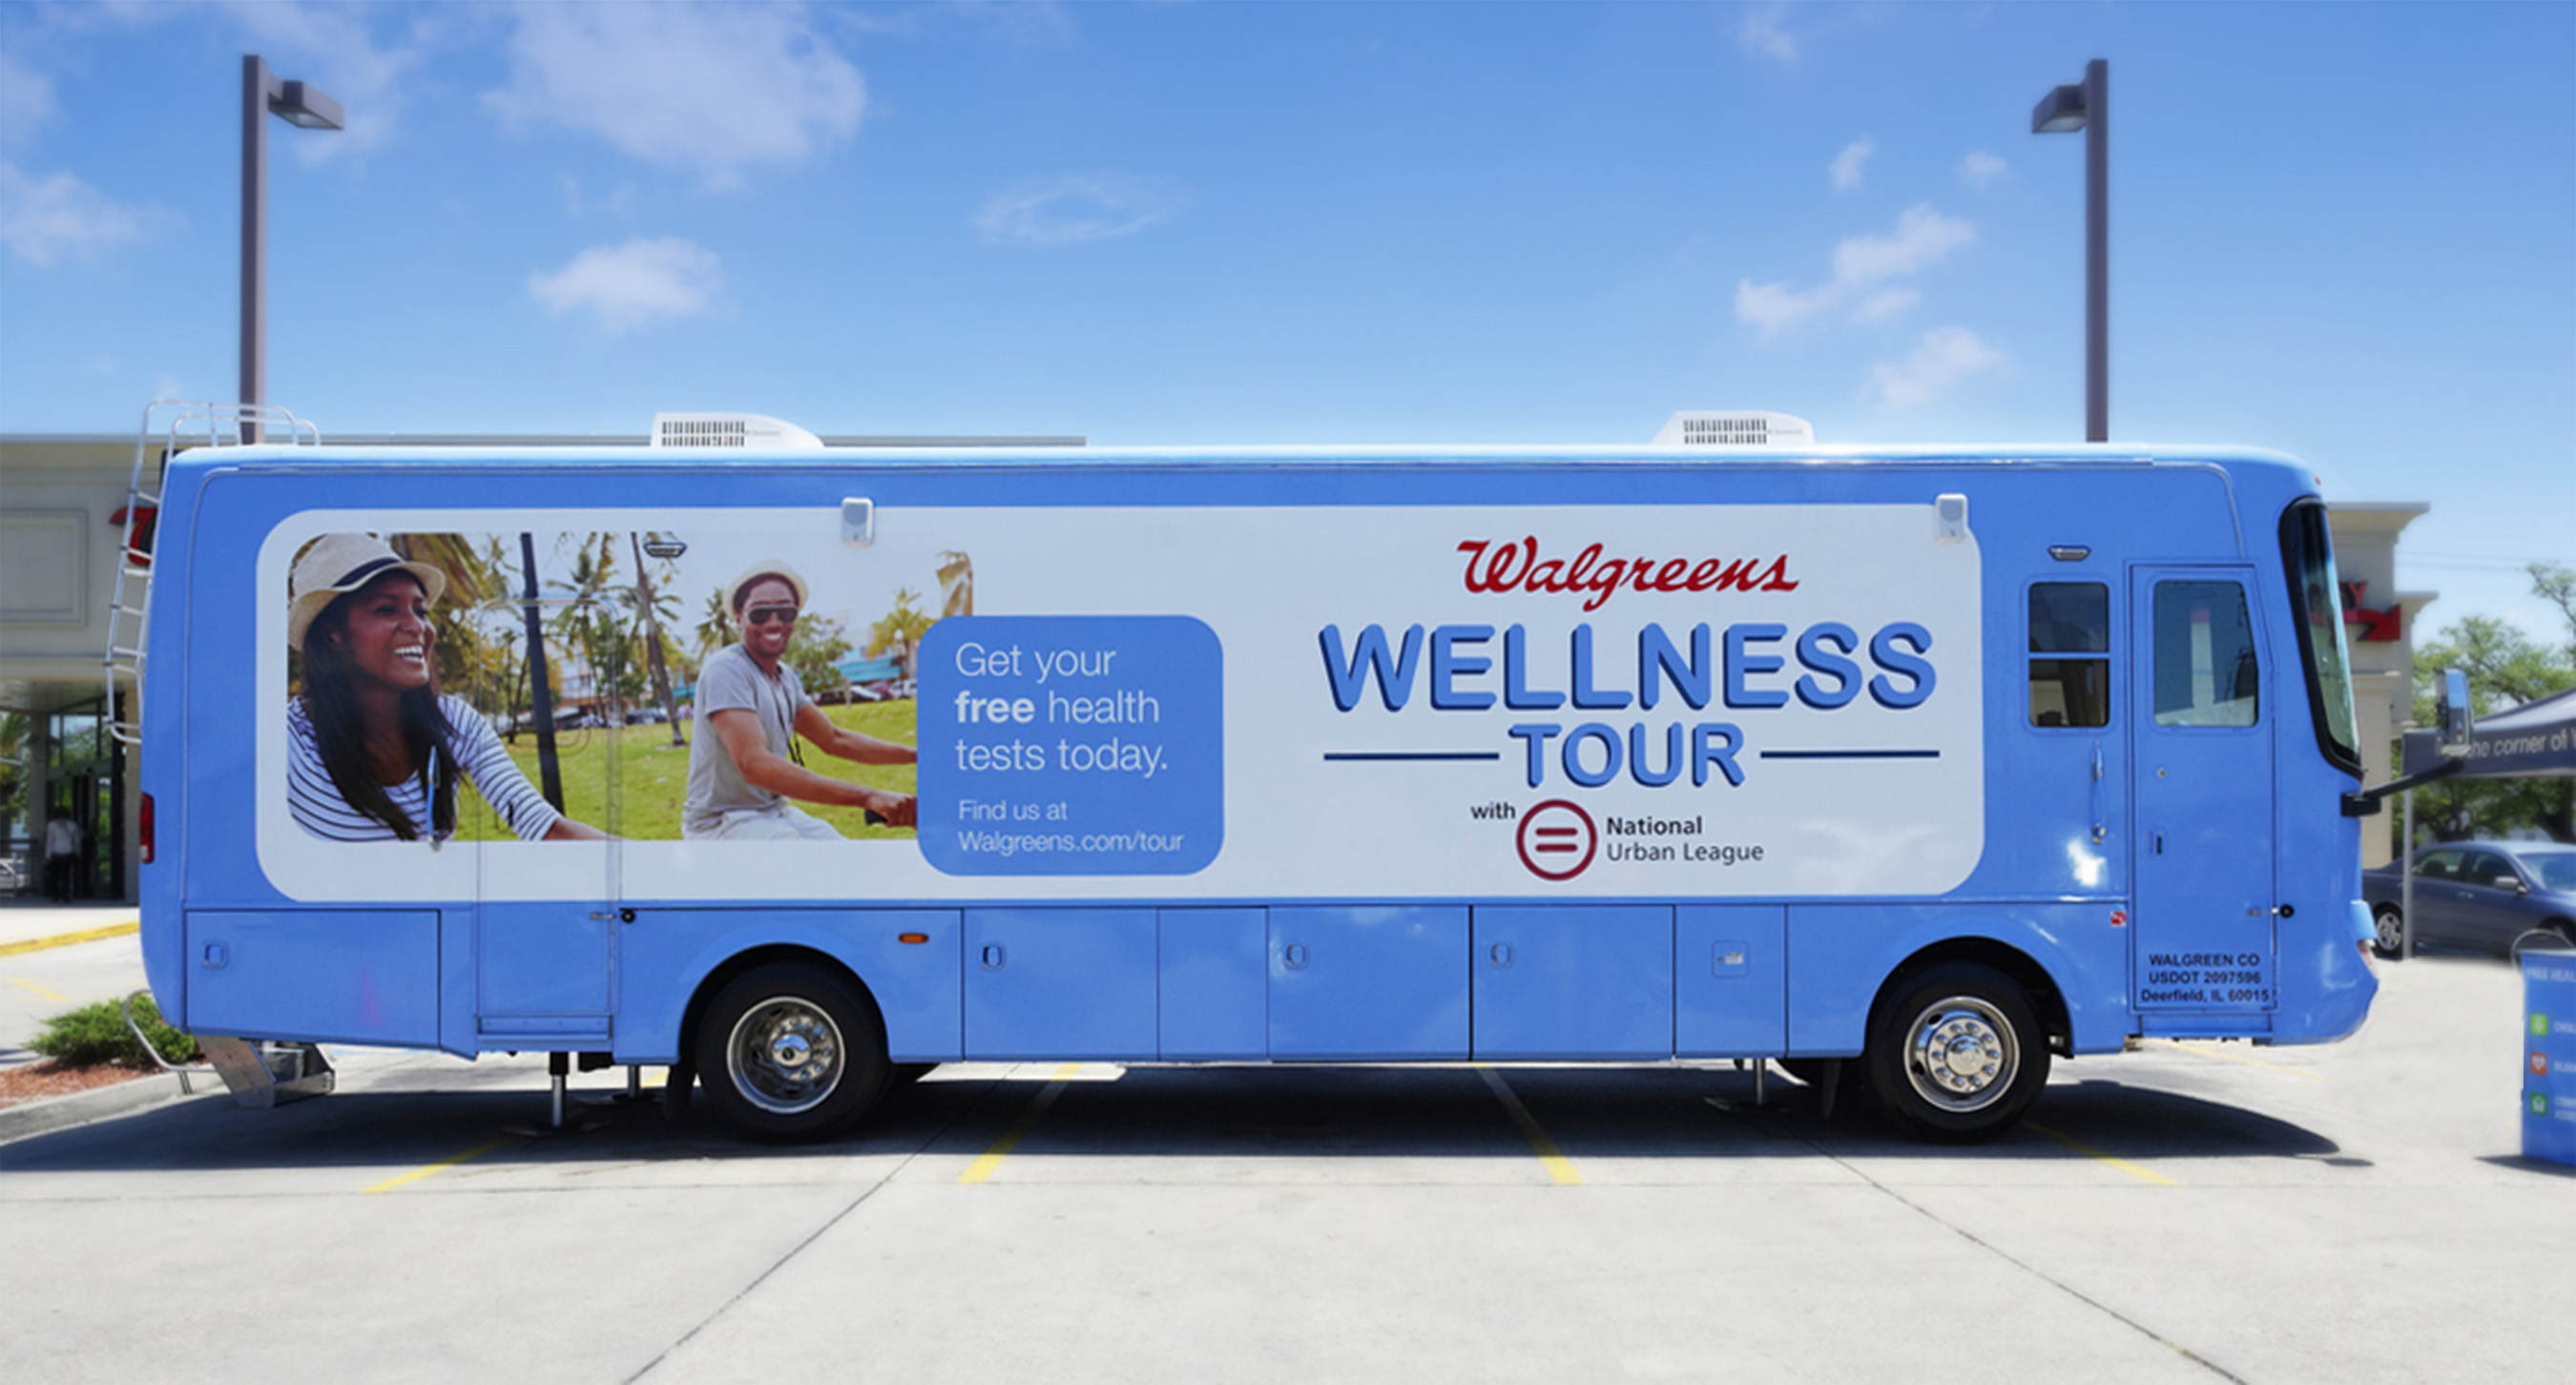 The Wellness Tour